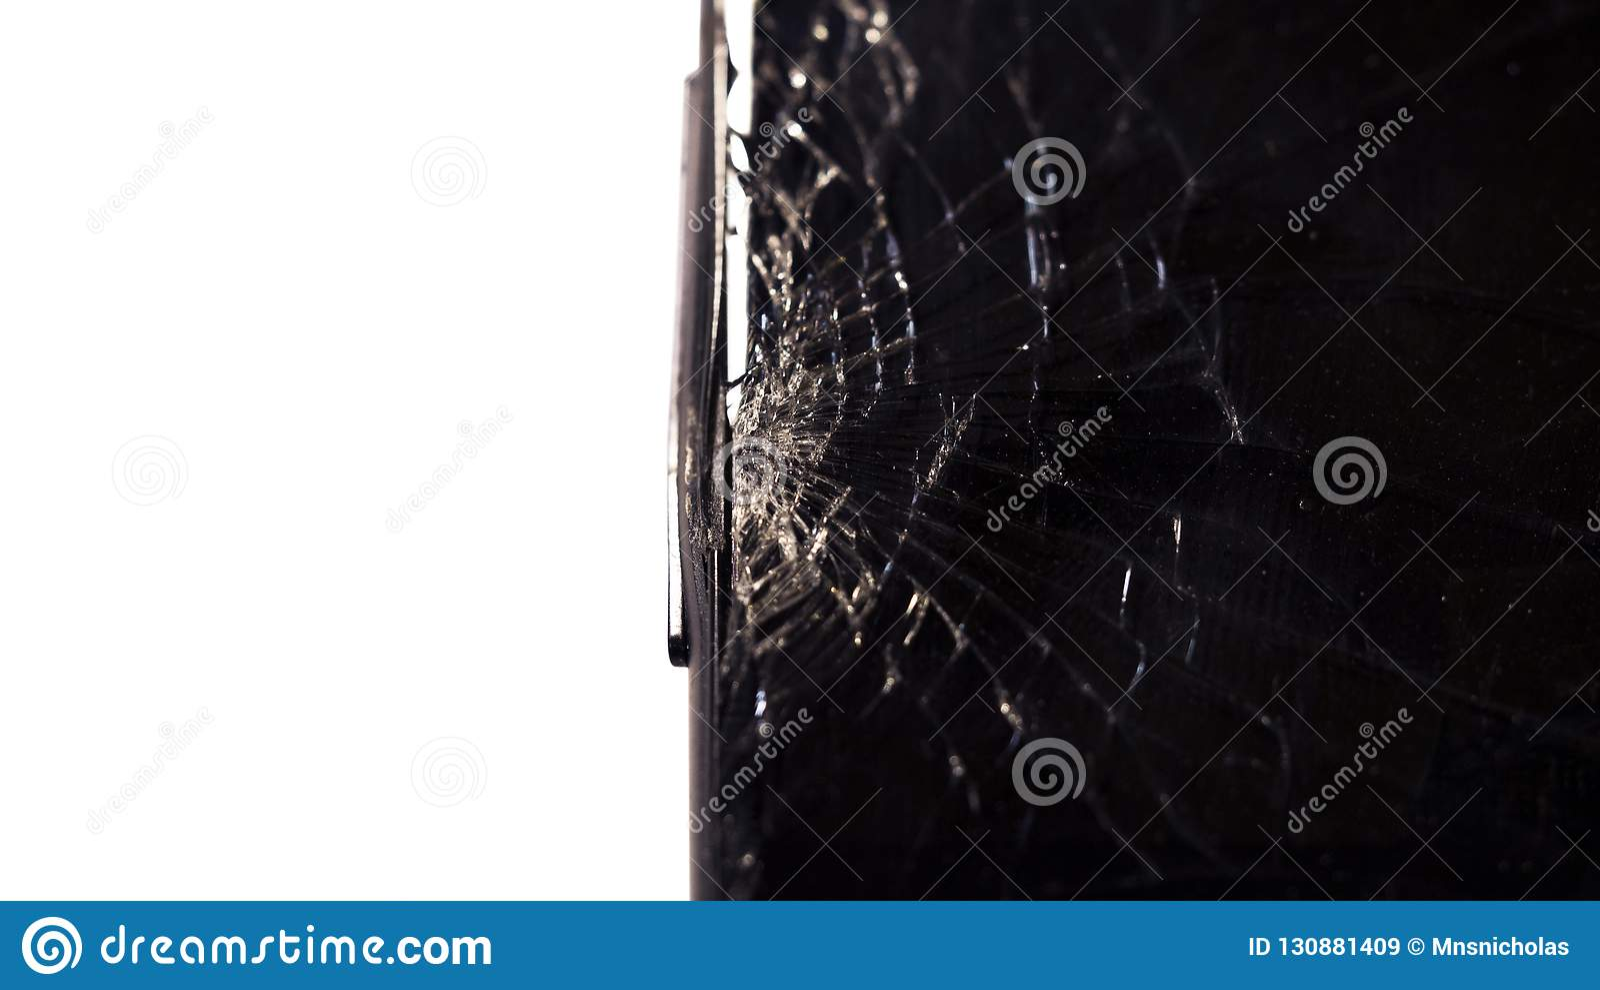 Close-up macro of broken dark glass. Elements of smartphone, screen, hammer blow, dropped smartphone